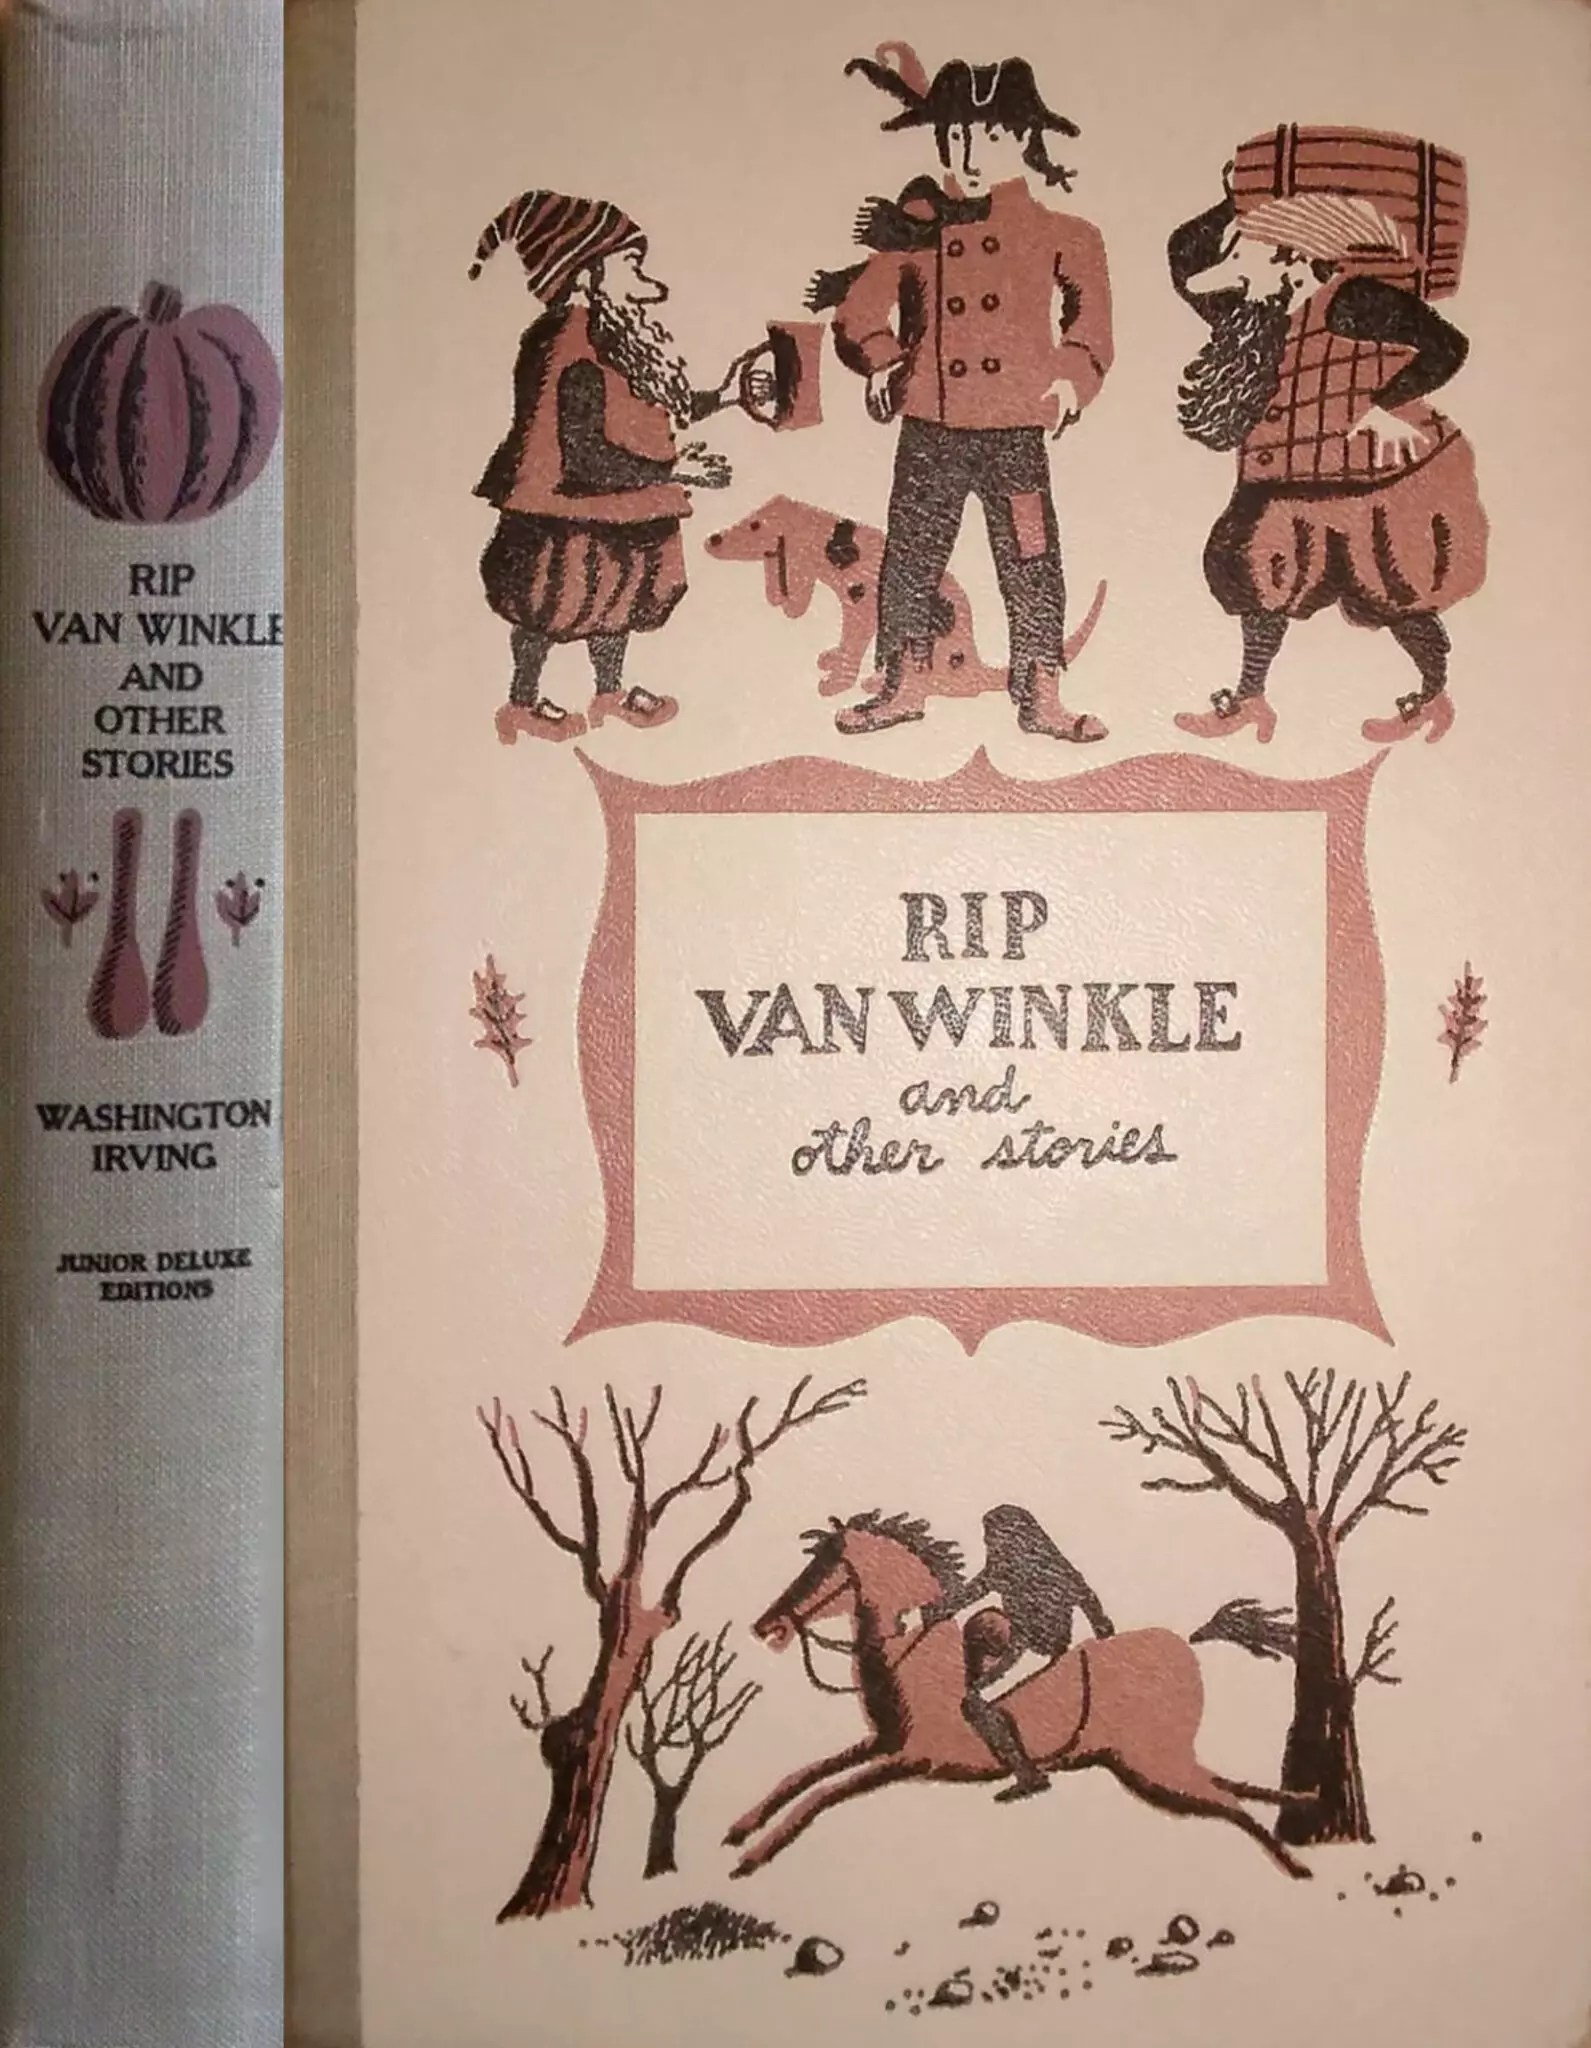 JDE Rip van Winkle FULL grey cover